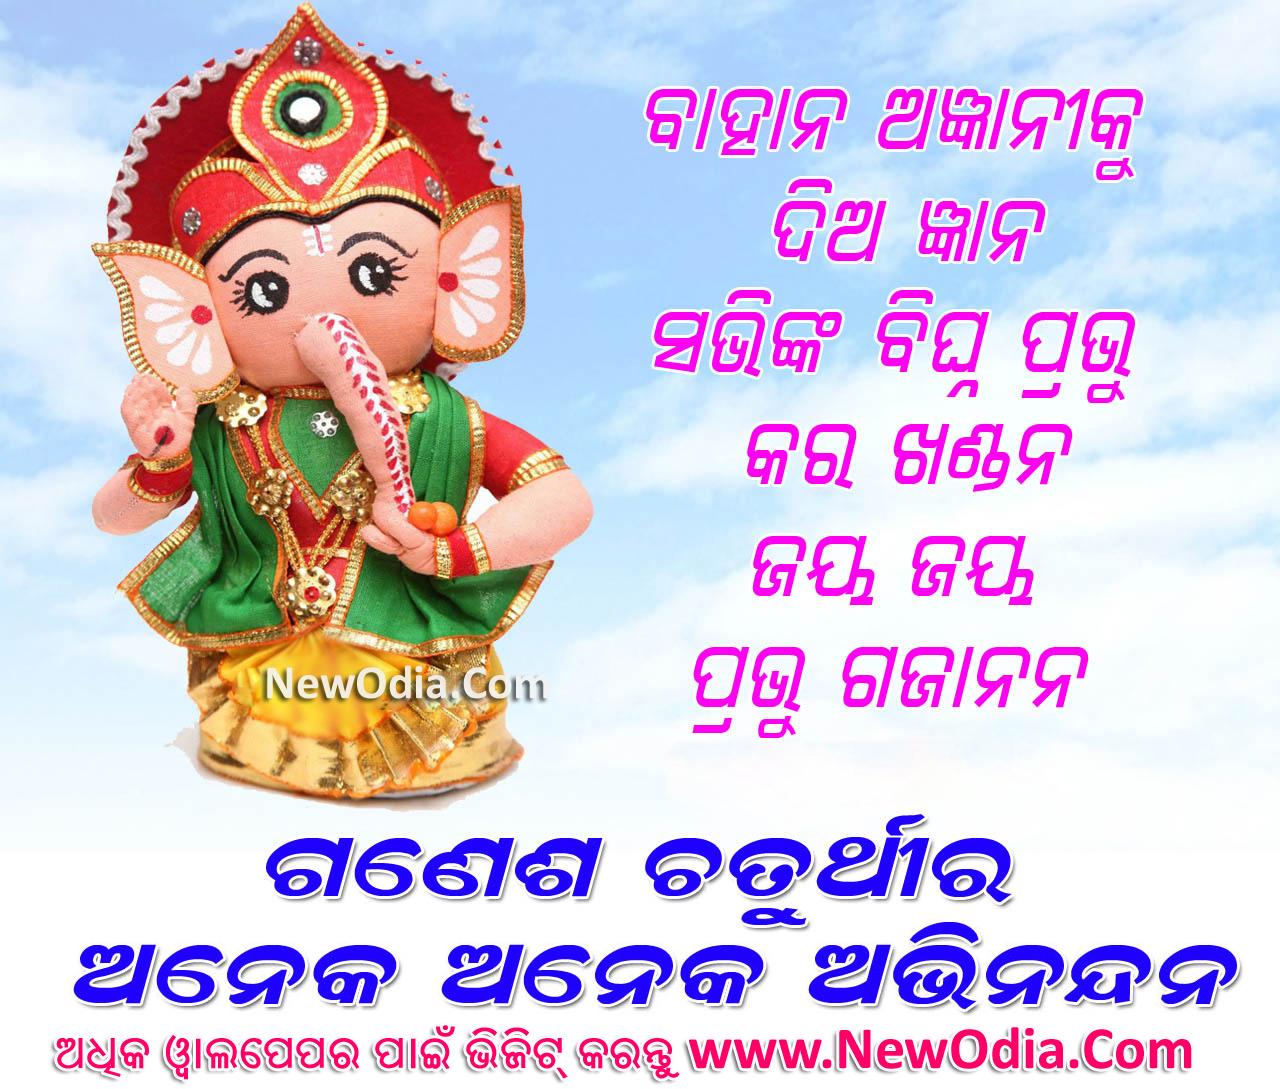 Download Ganesh Puja 2017 Odia HD Wallpaper for Whatsapp